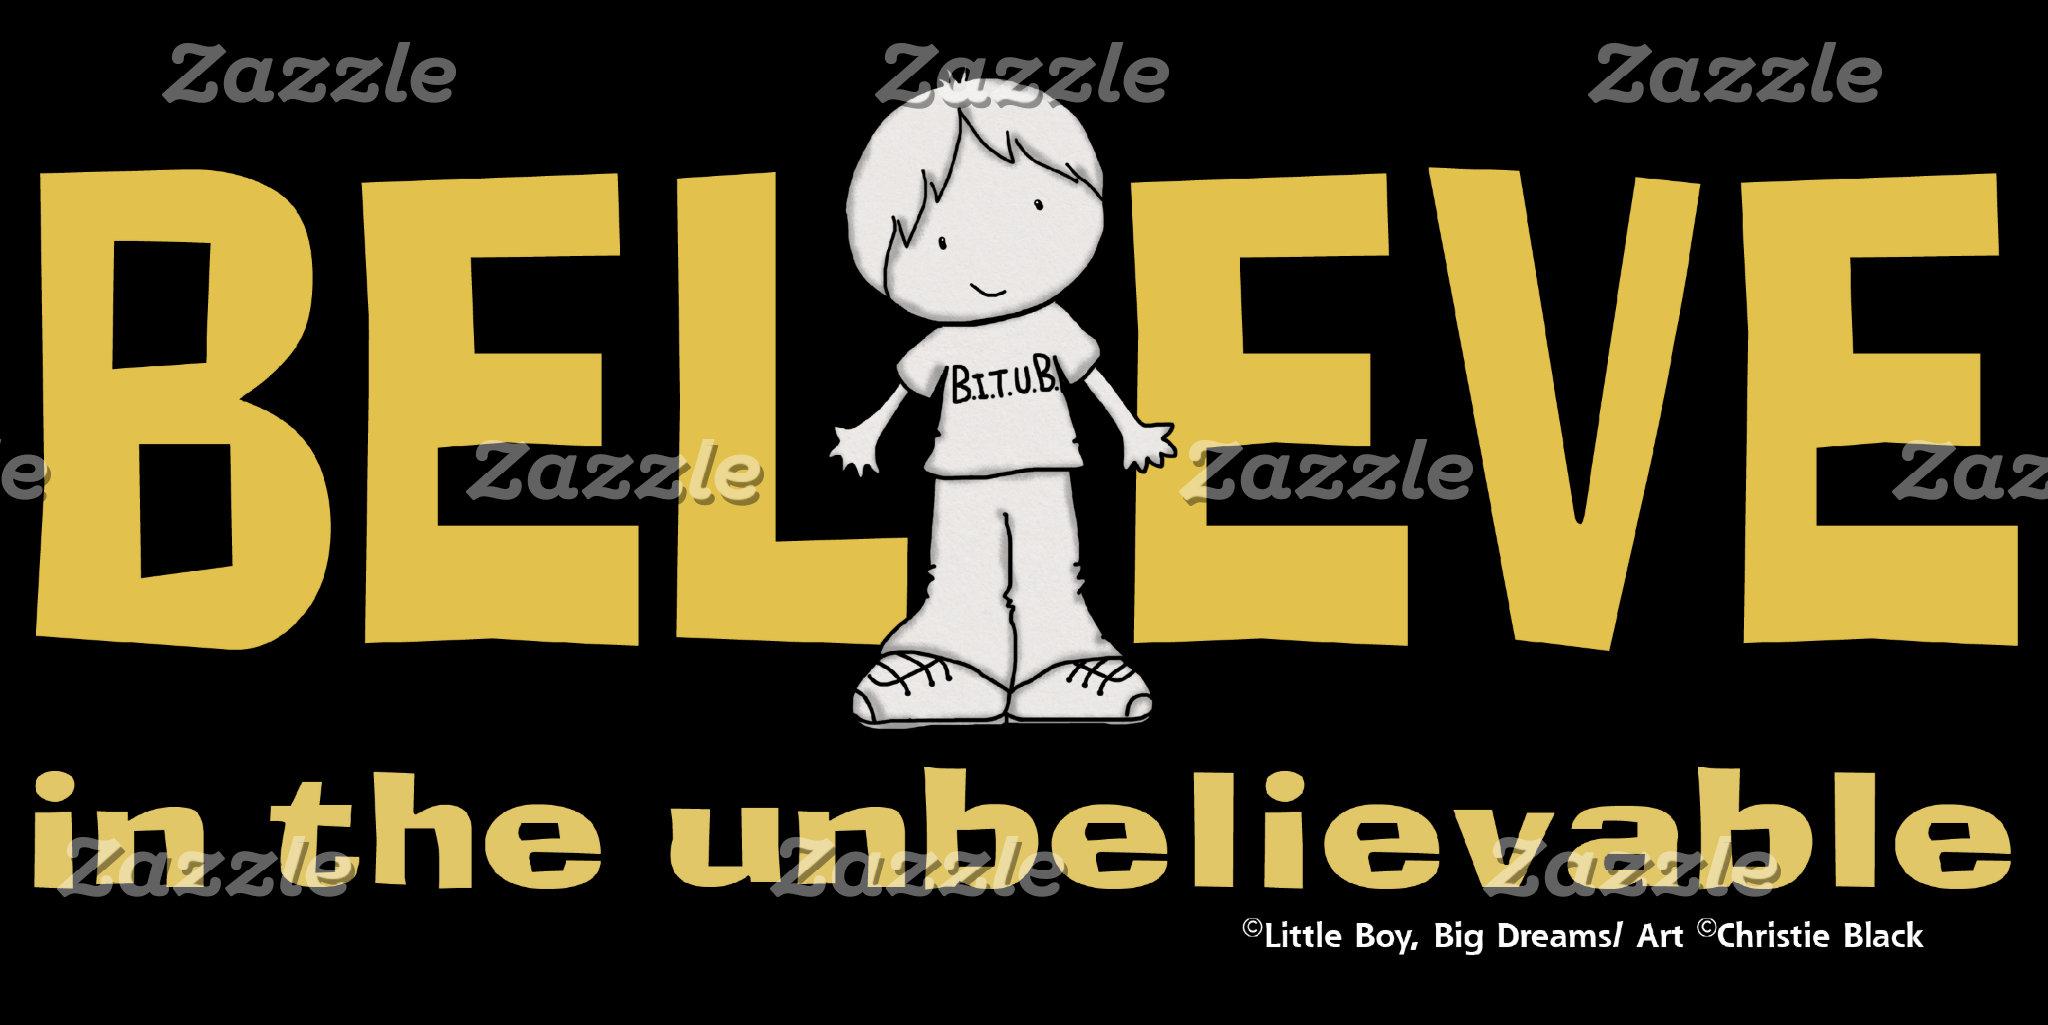 Believe in the Unbelievable